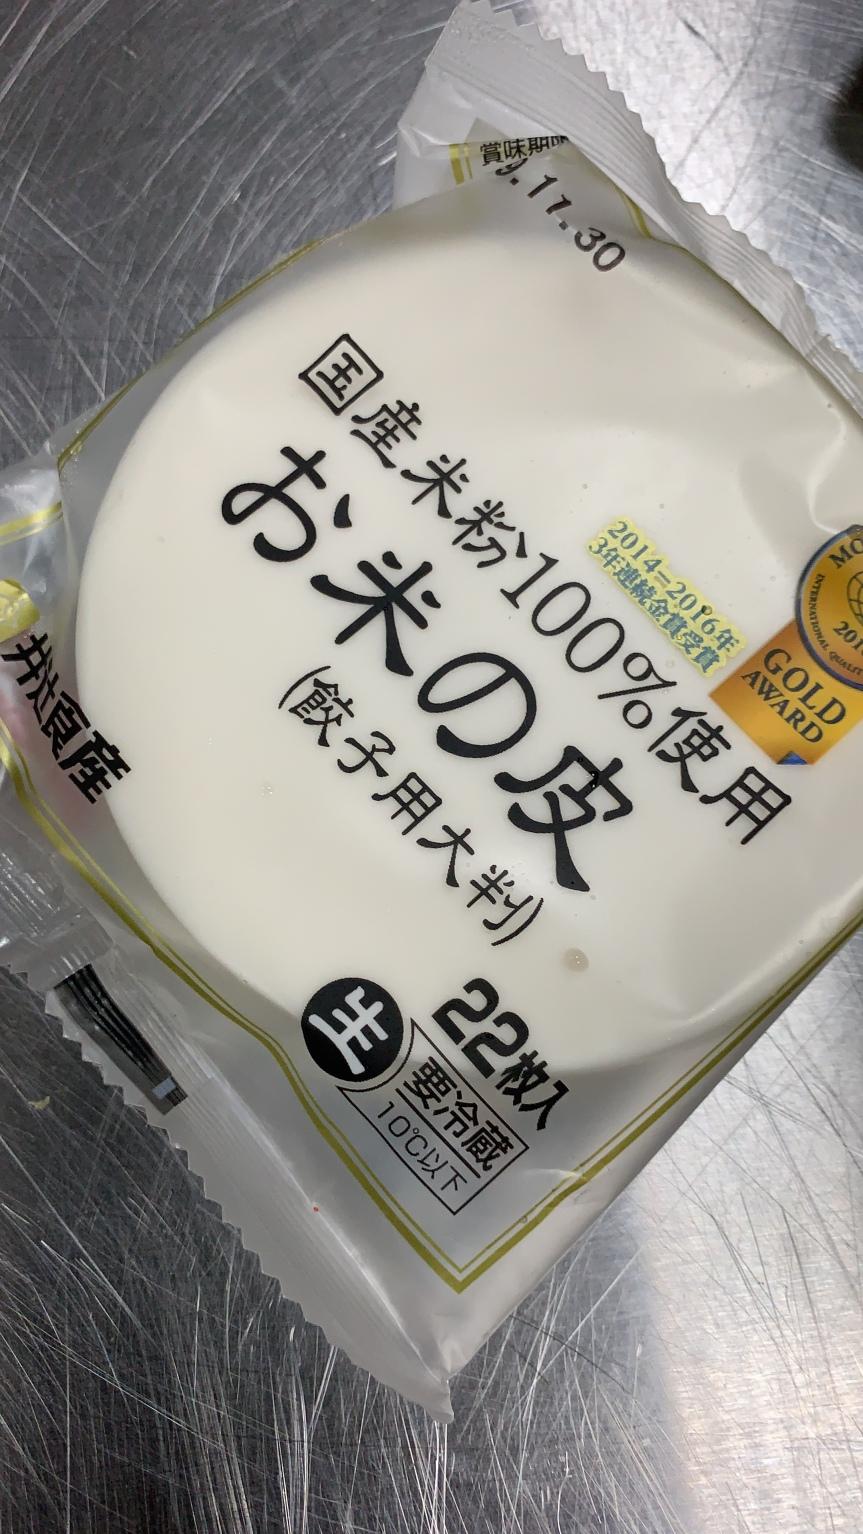 Gluten free porkGyoza